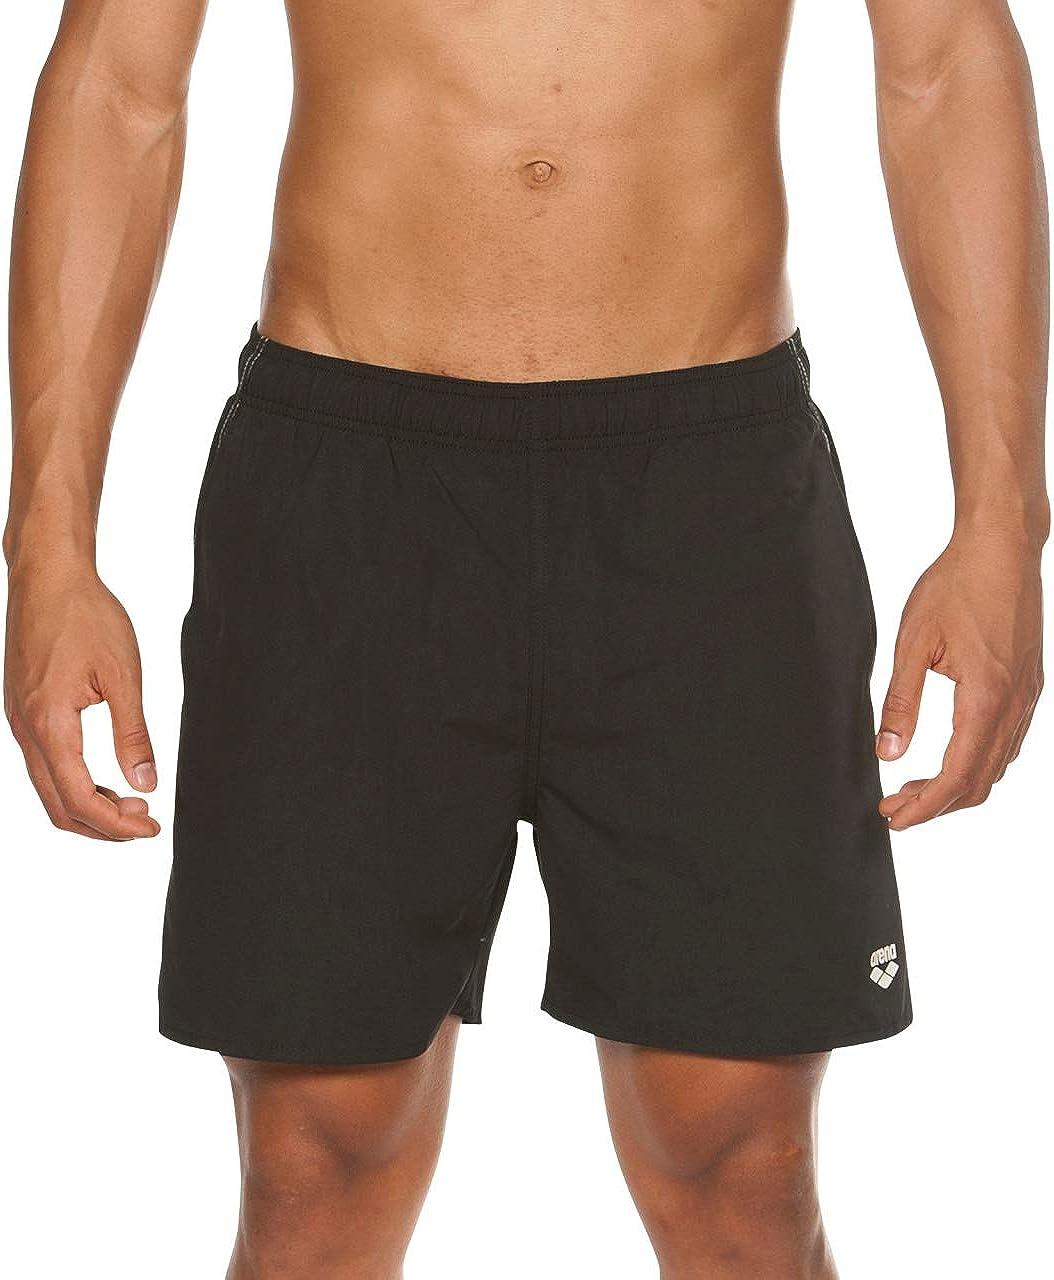 Arena Men's Max 58% OFF Fundamentals Japan's largest assortment Boxer Swimsuit Short Swim Trunks